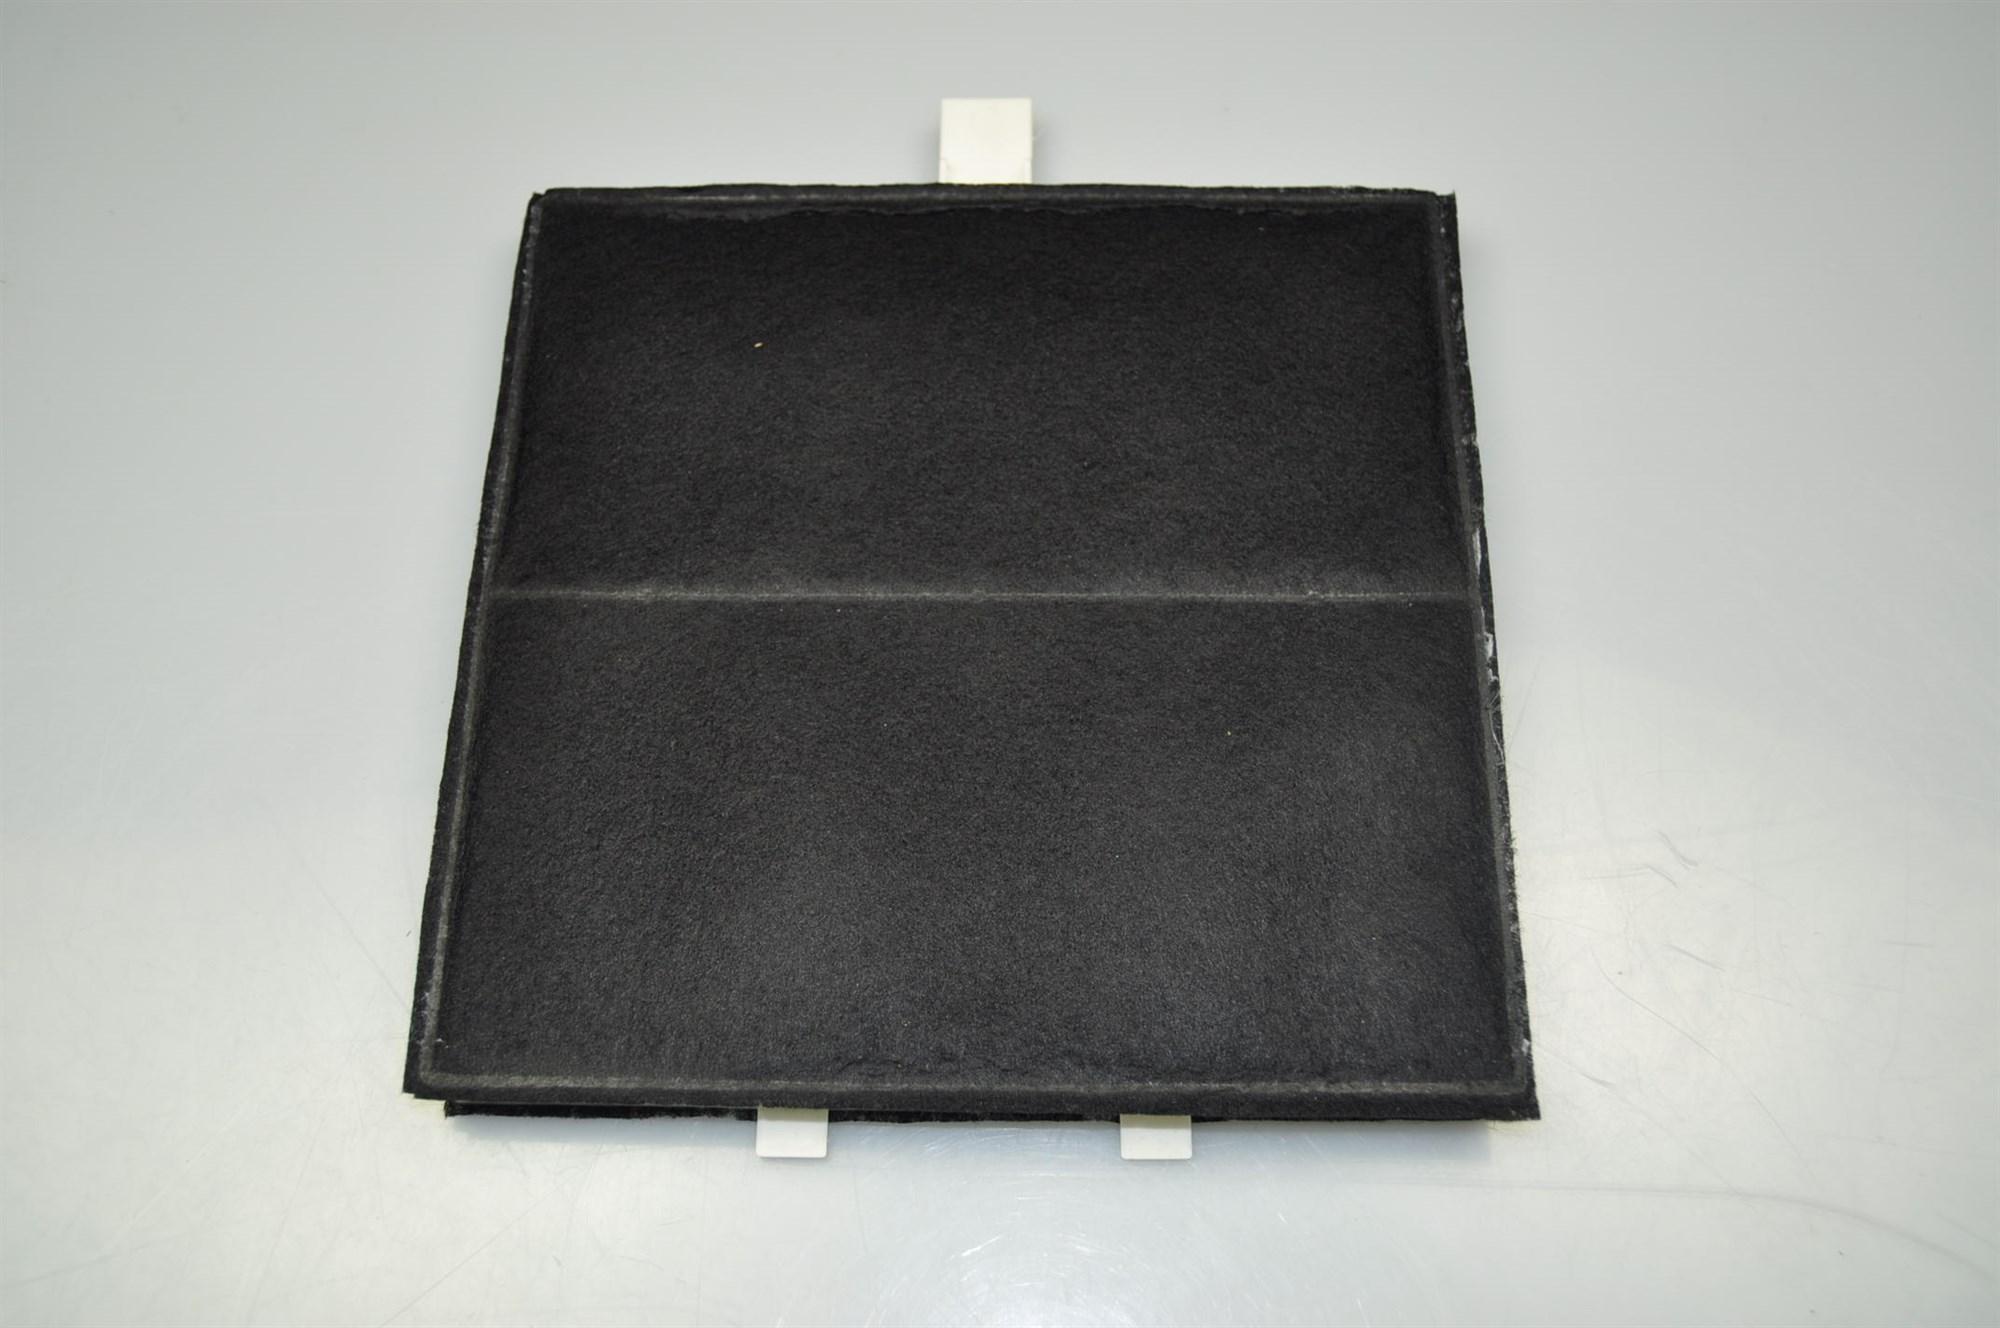 Kohlefilter siemens dunstabzugshaube 23 mm x 222 mm x 226 mm